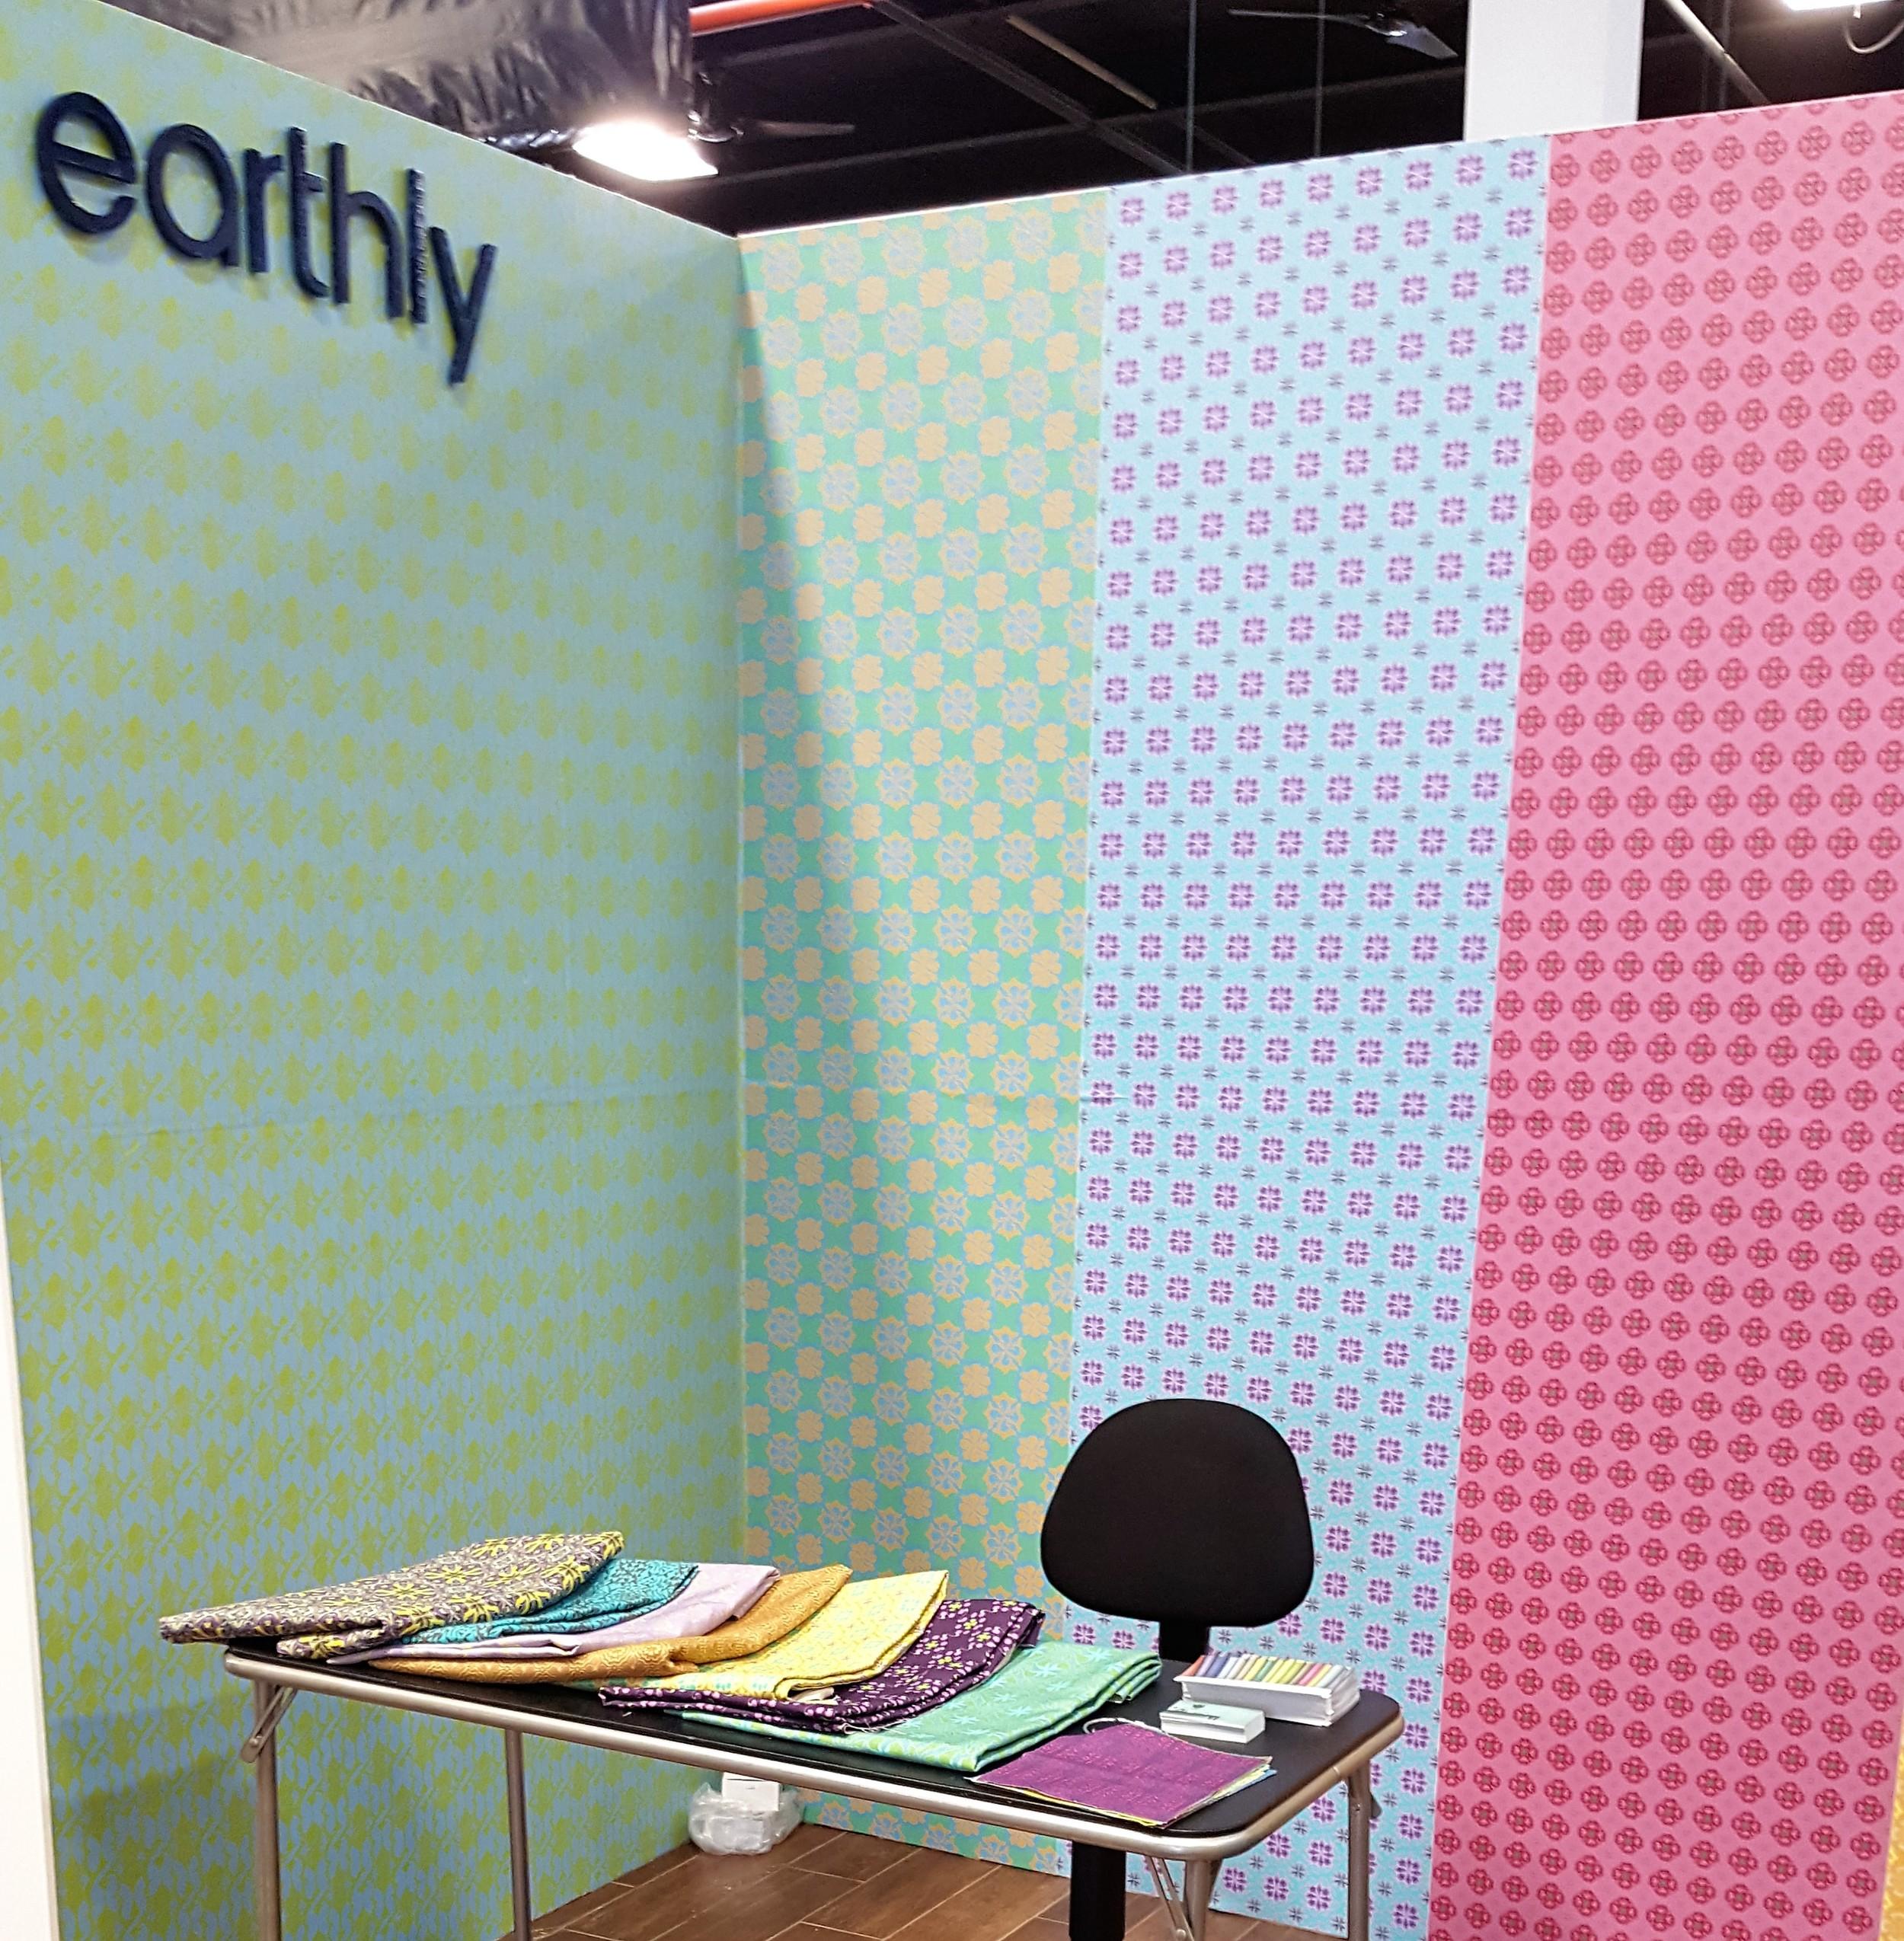 CATEGORY: TEXTILES  Earthly for hemp-based, eco-friendly fabrics